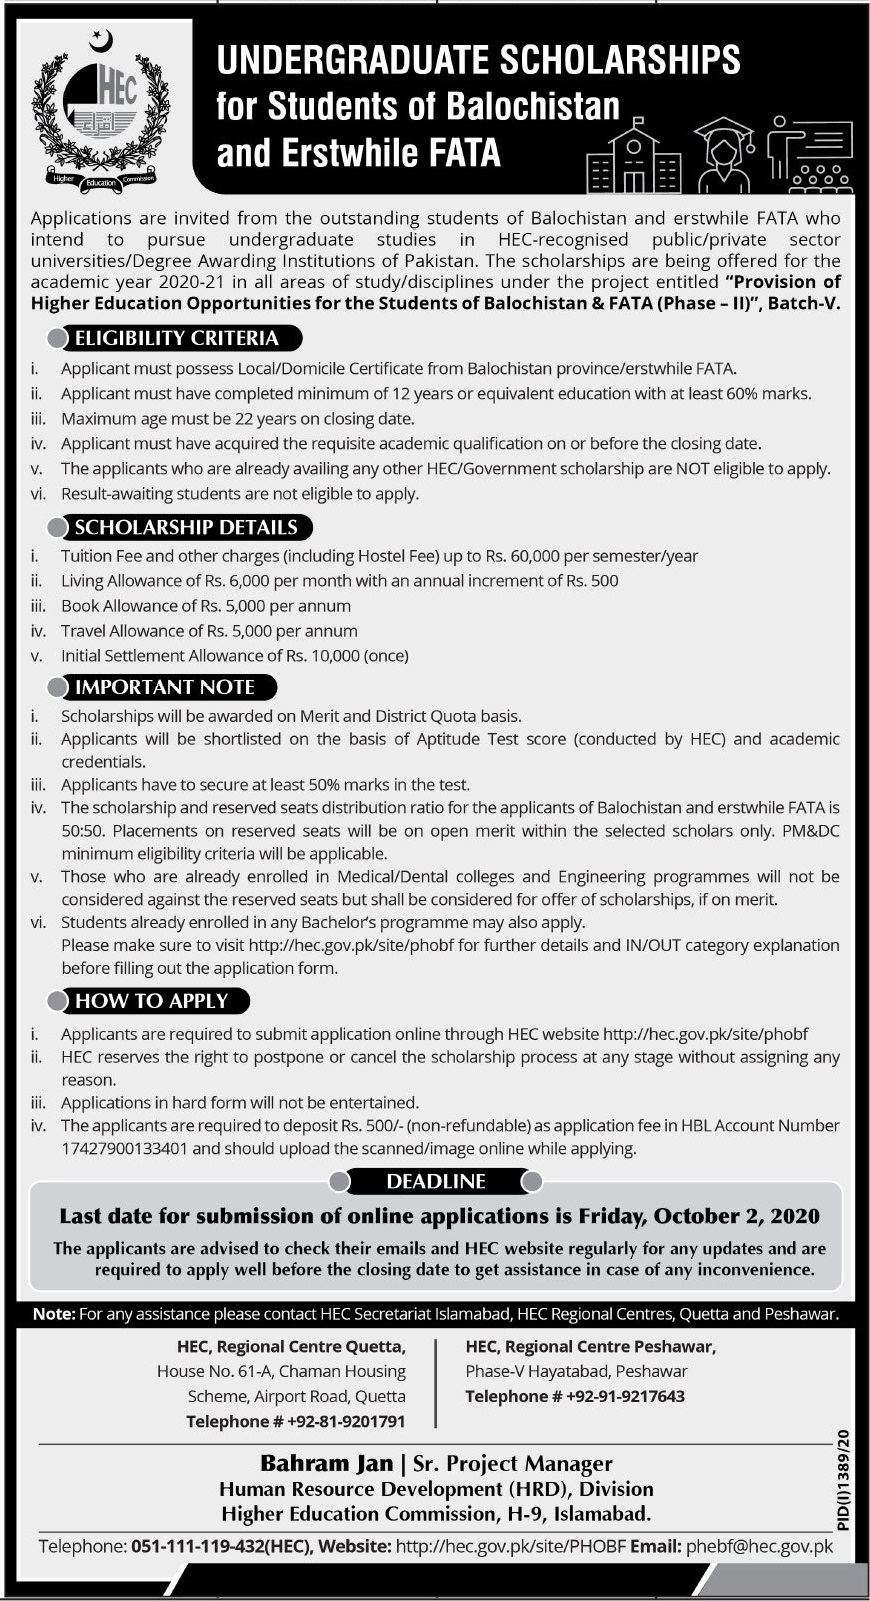 Undergraduate Scholarships for Students of Balochistan